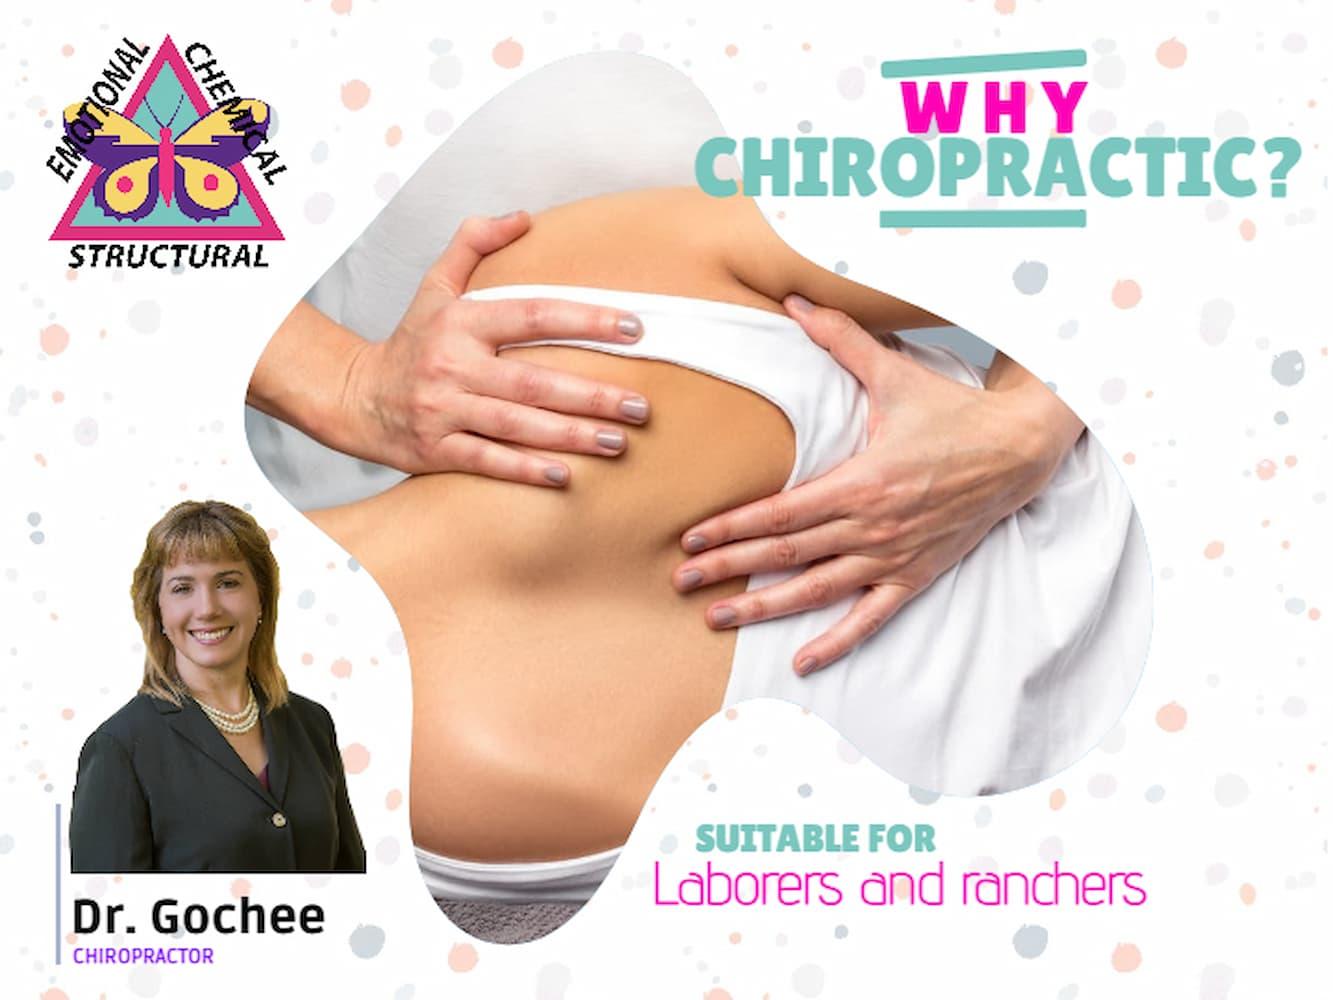 Dr. Gochee Chiropractic